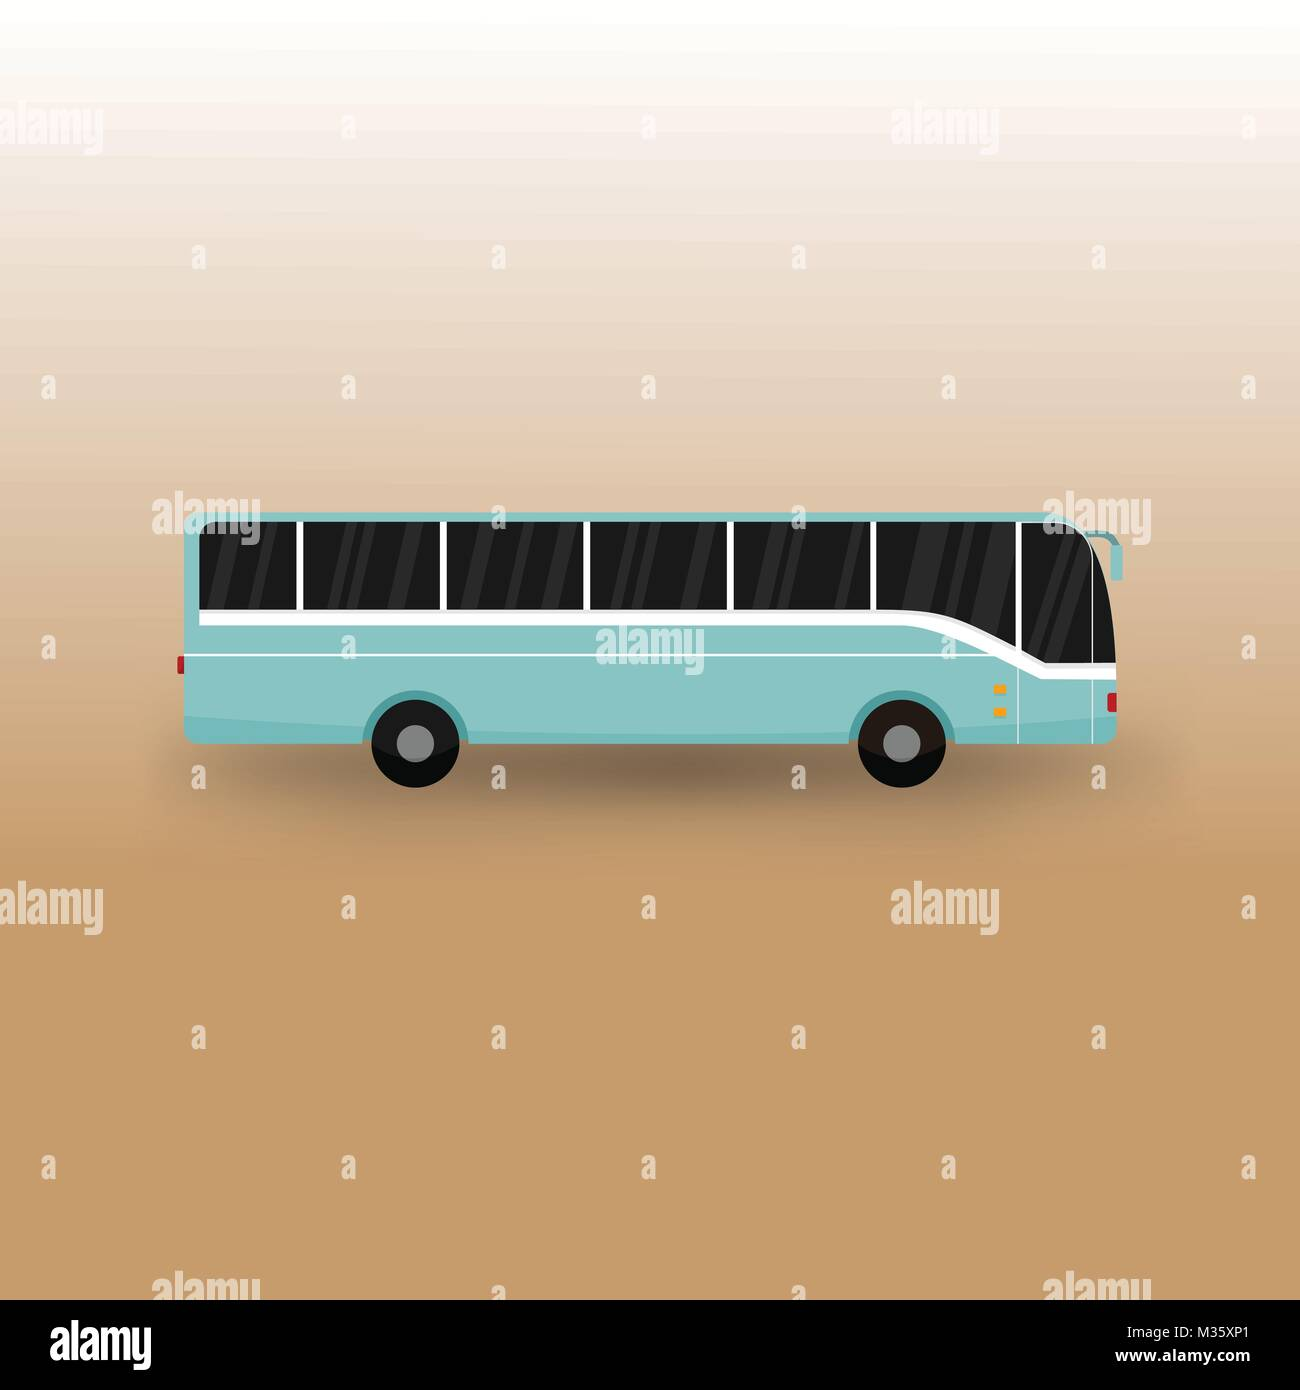 Public Bus Transportation Vector Illustration Graphic Design - Stock Image